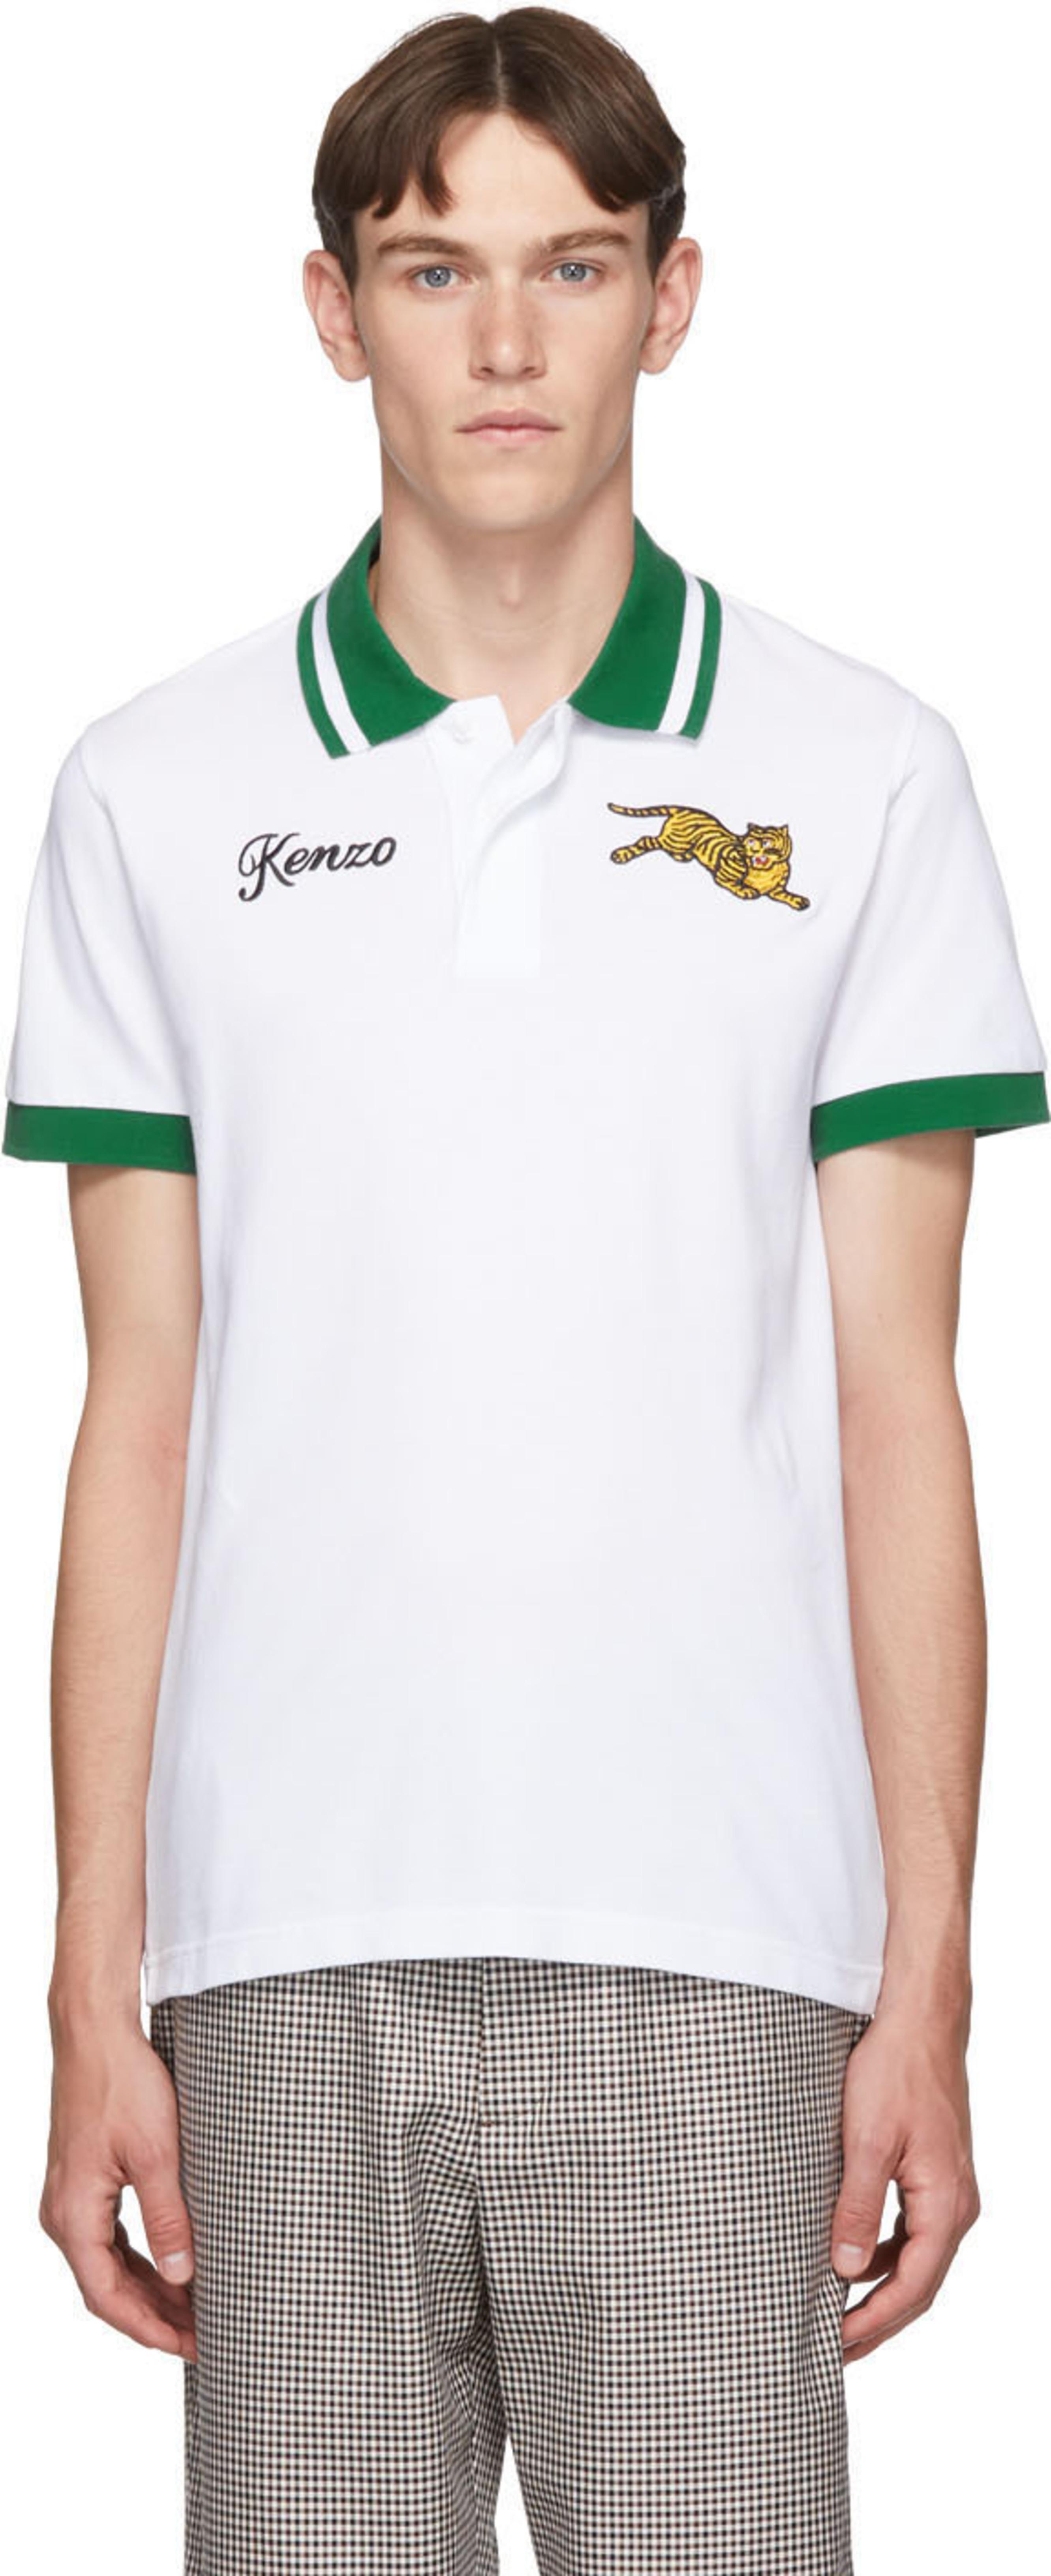 d04cb6fae40e Kenzo clothing for Men | SSENSE